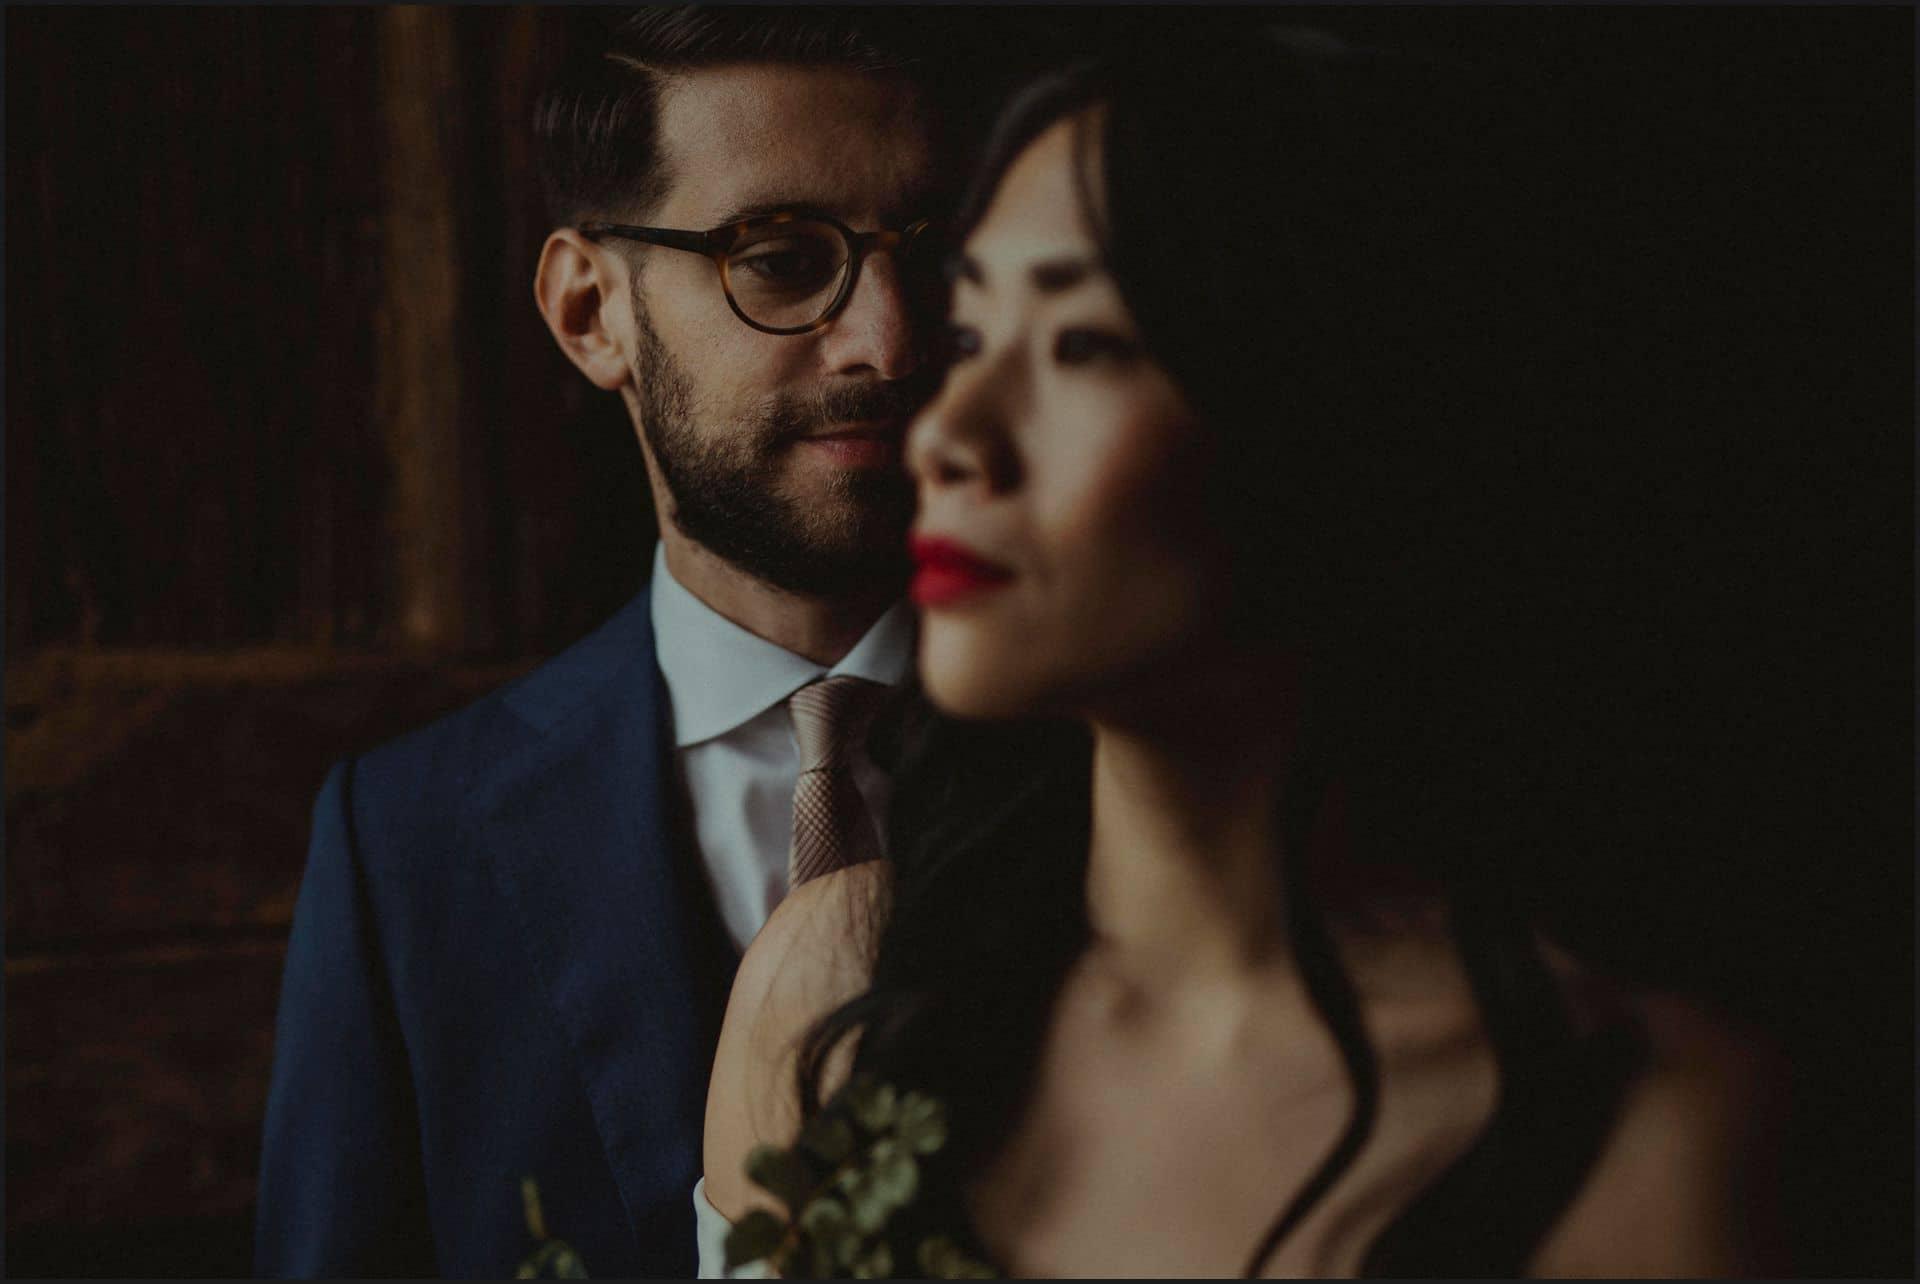 destination wedding, castello del trebbio, tuscany, bride, groom, romantic portrait